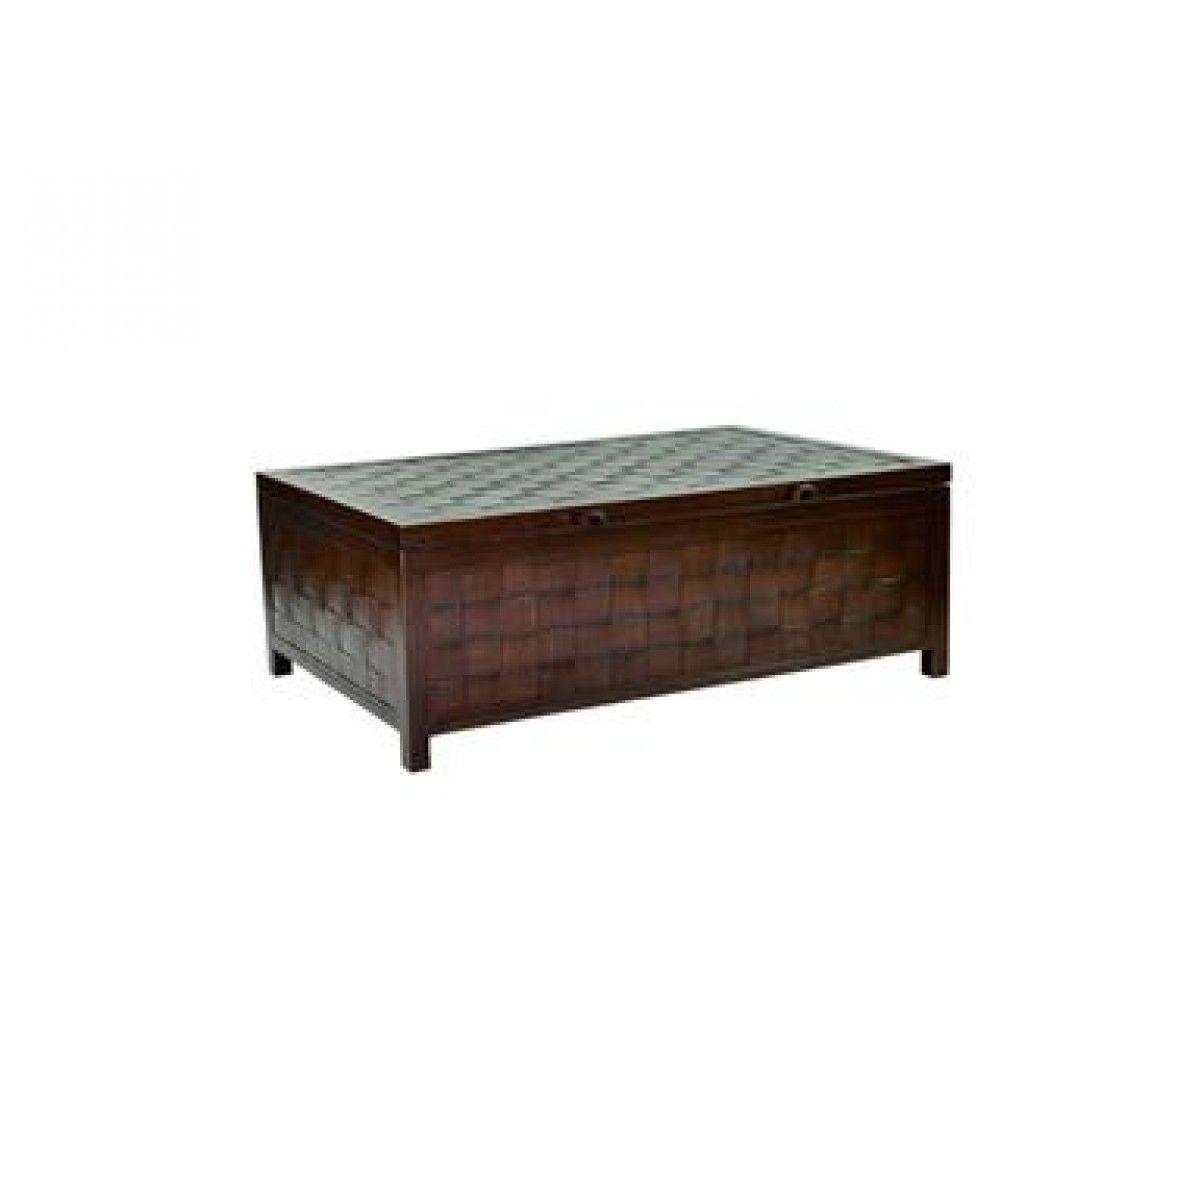 32 x 48 Inch Storage Chest / Coffee Table VRC3248